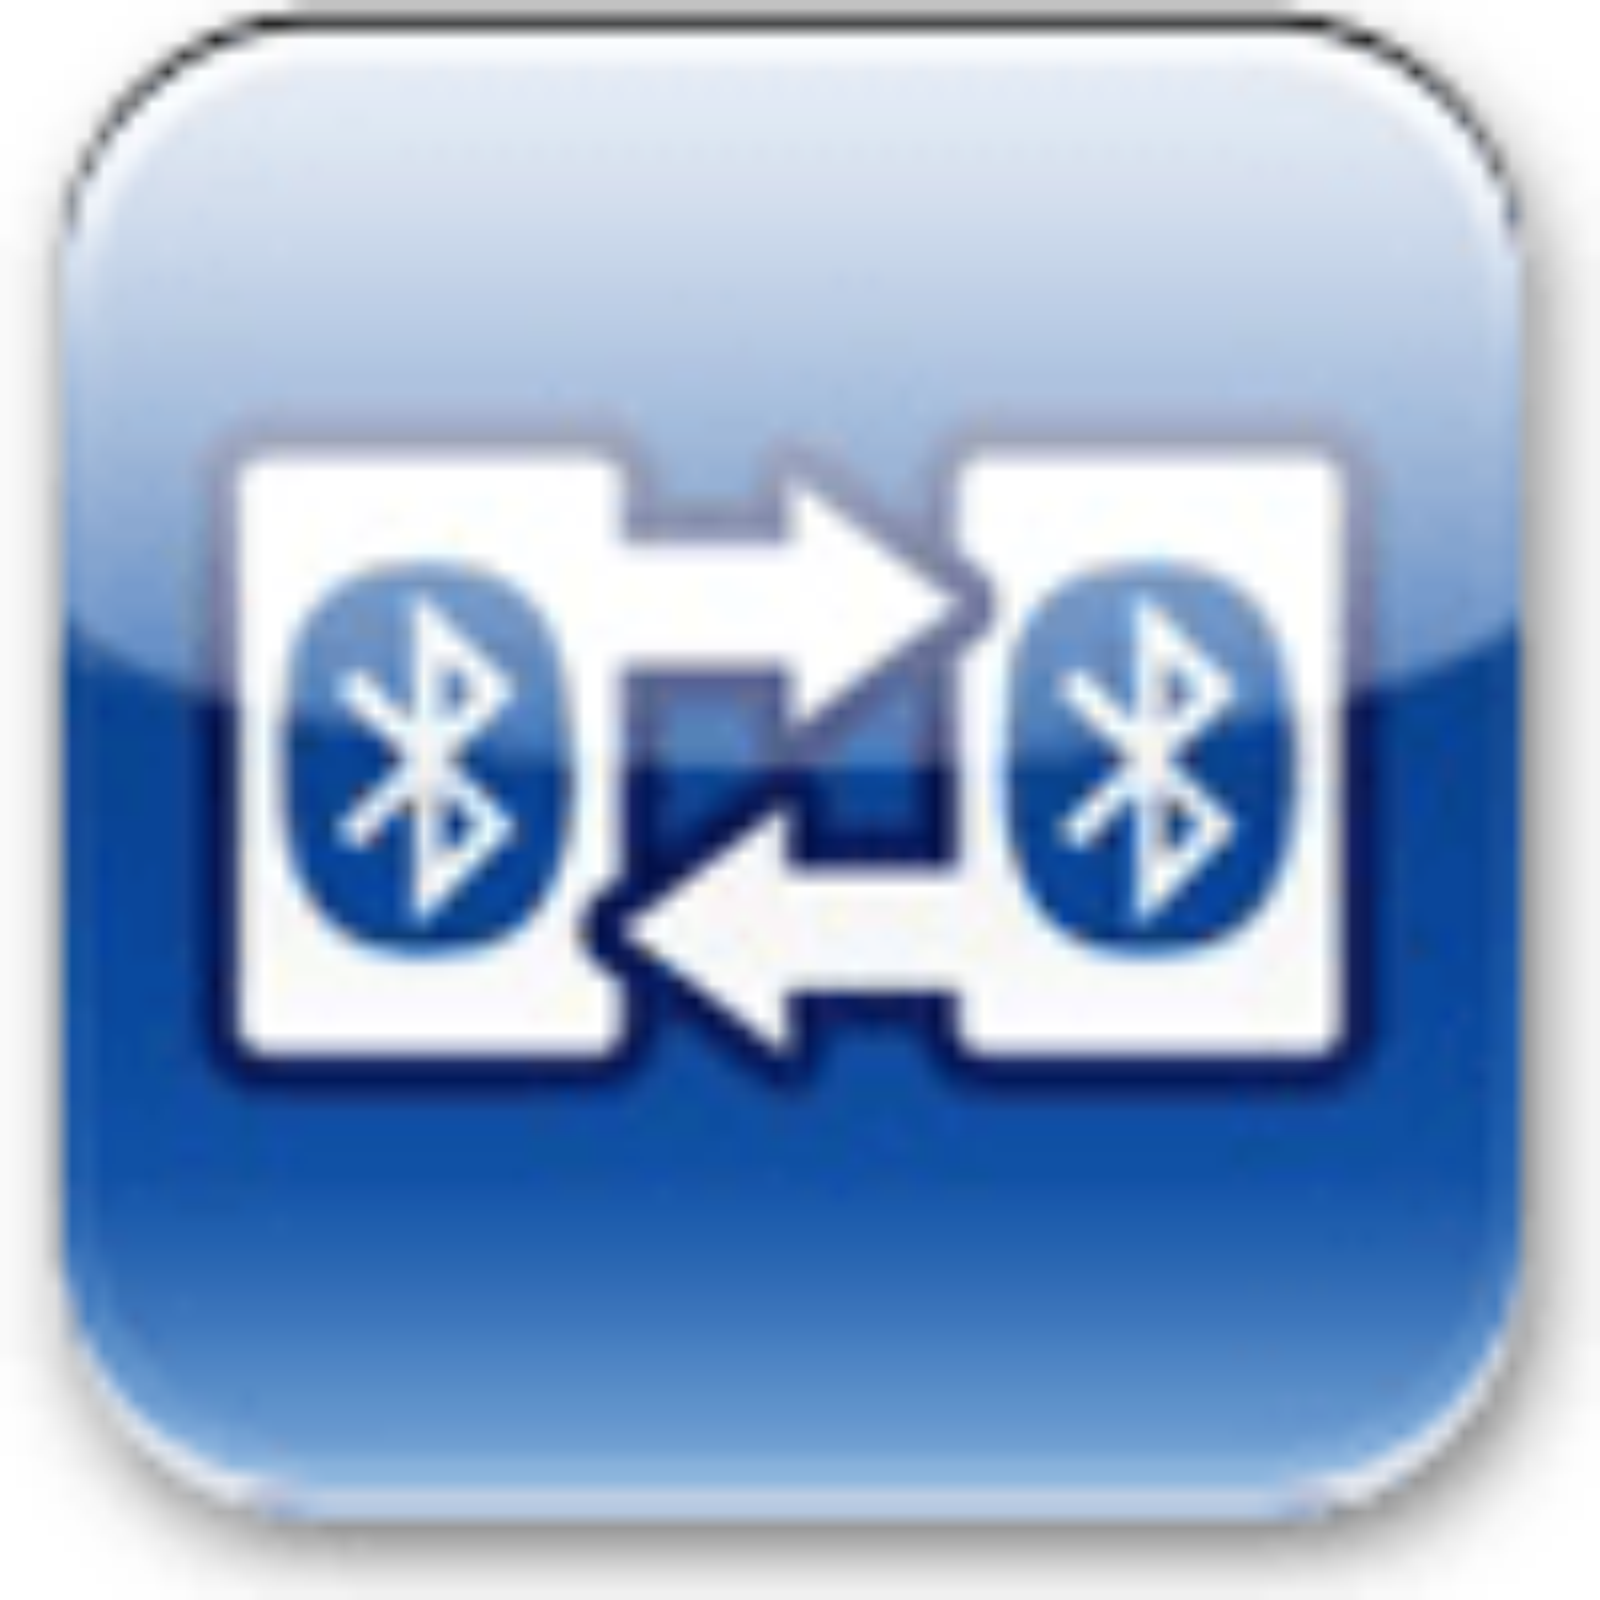 Bluetooth Photo Share 1.3.3